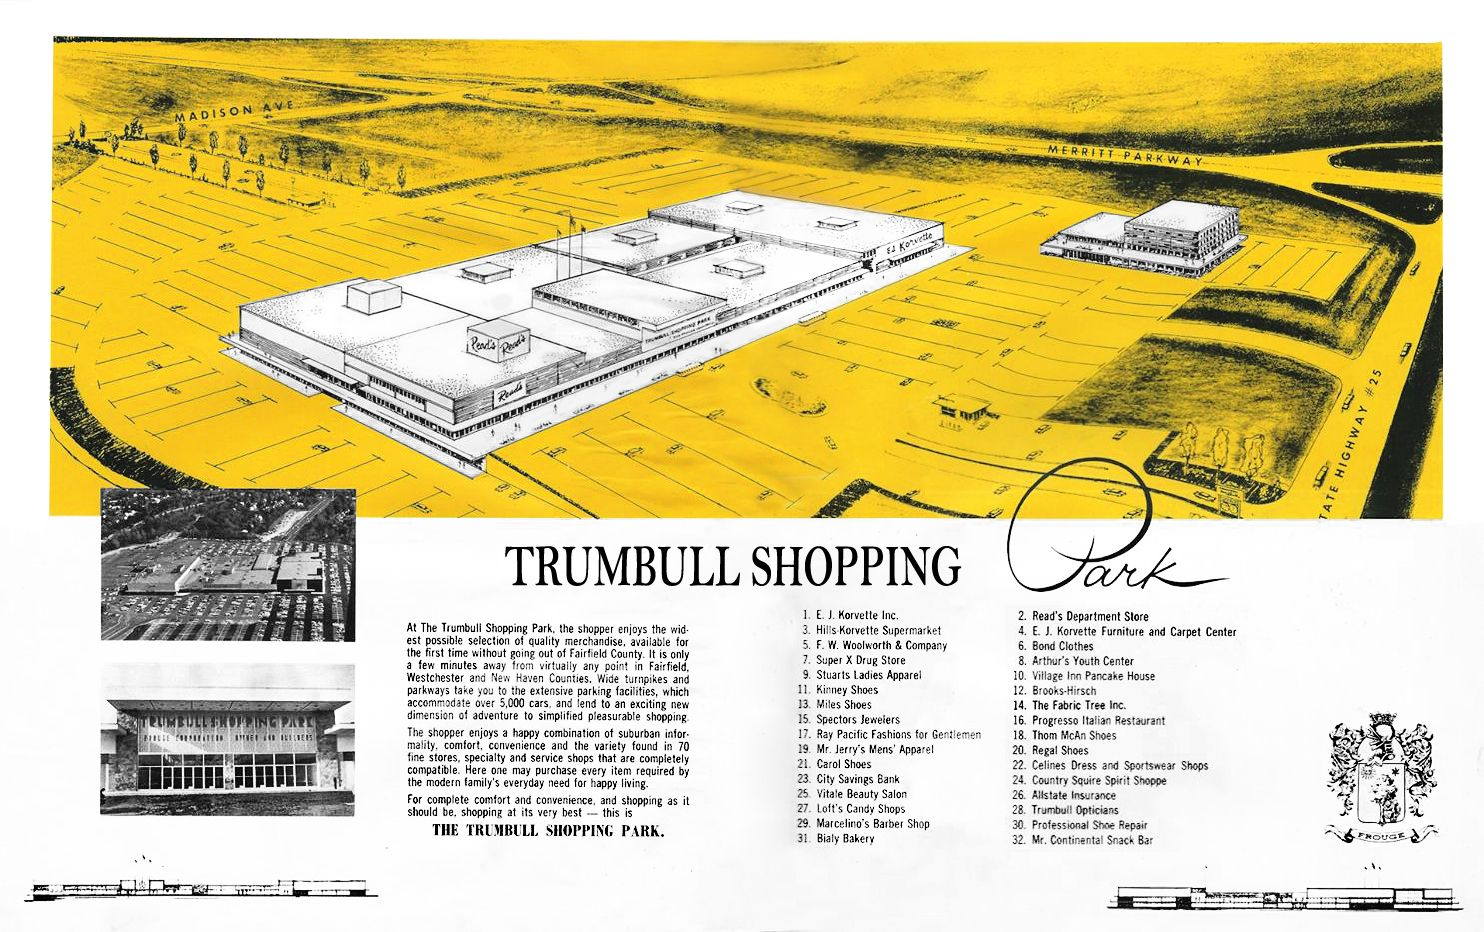 Trumbull Shopping Park Bridgeport Connecticut Trumbull Hometown